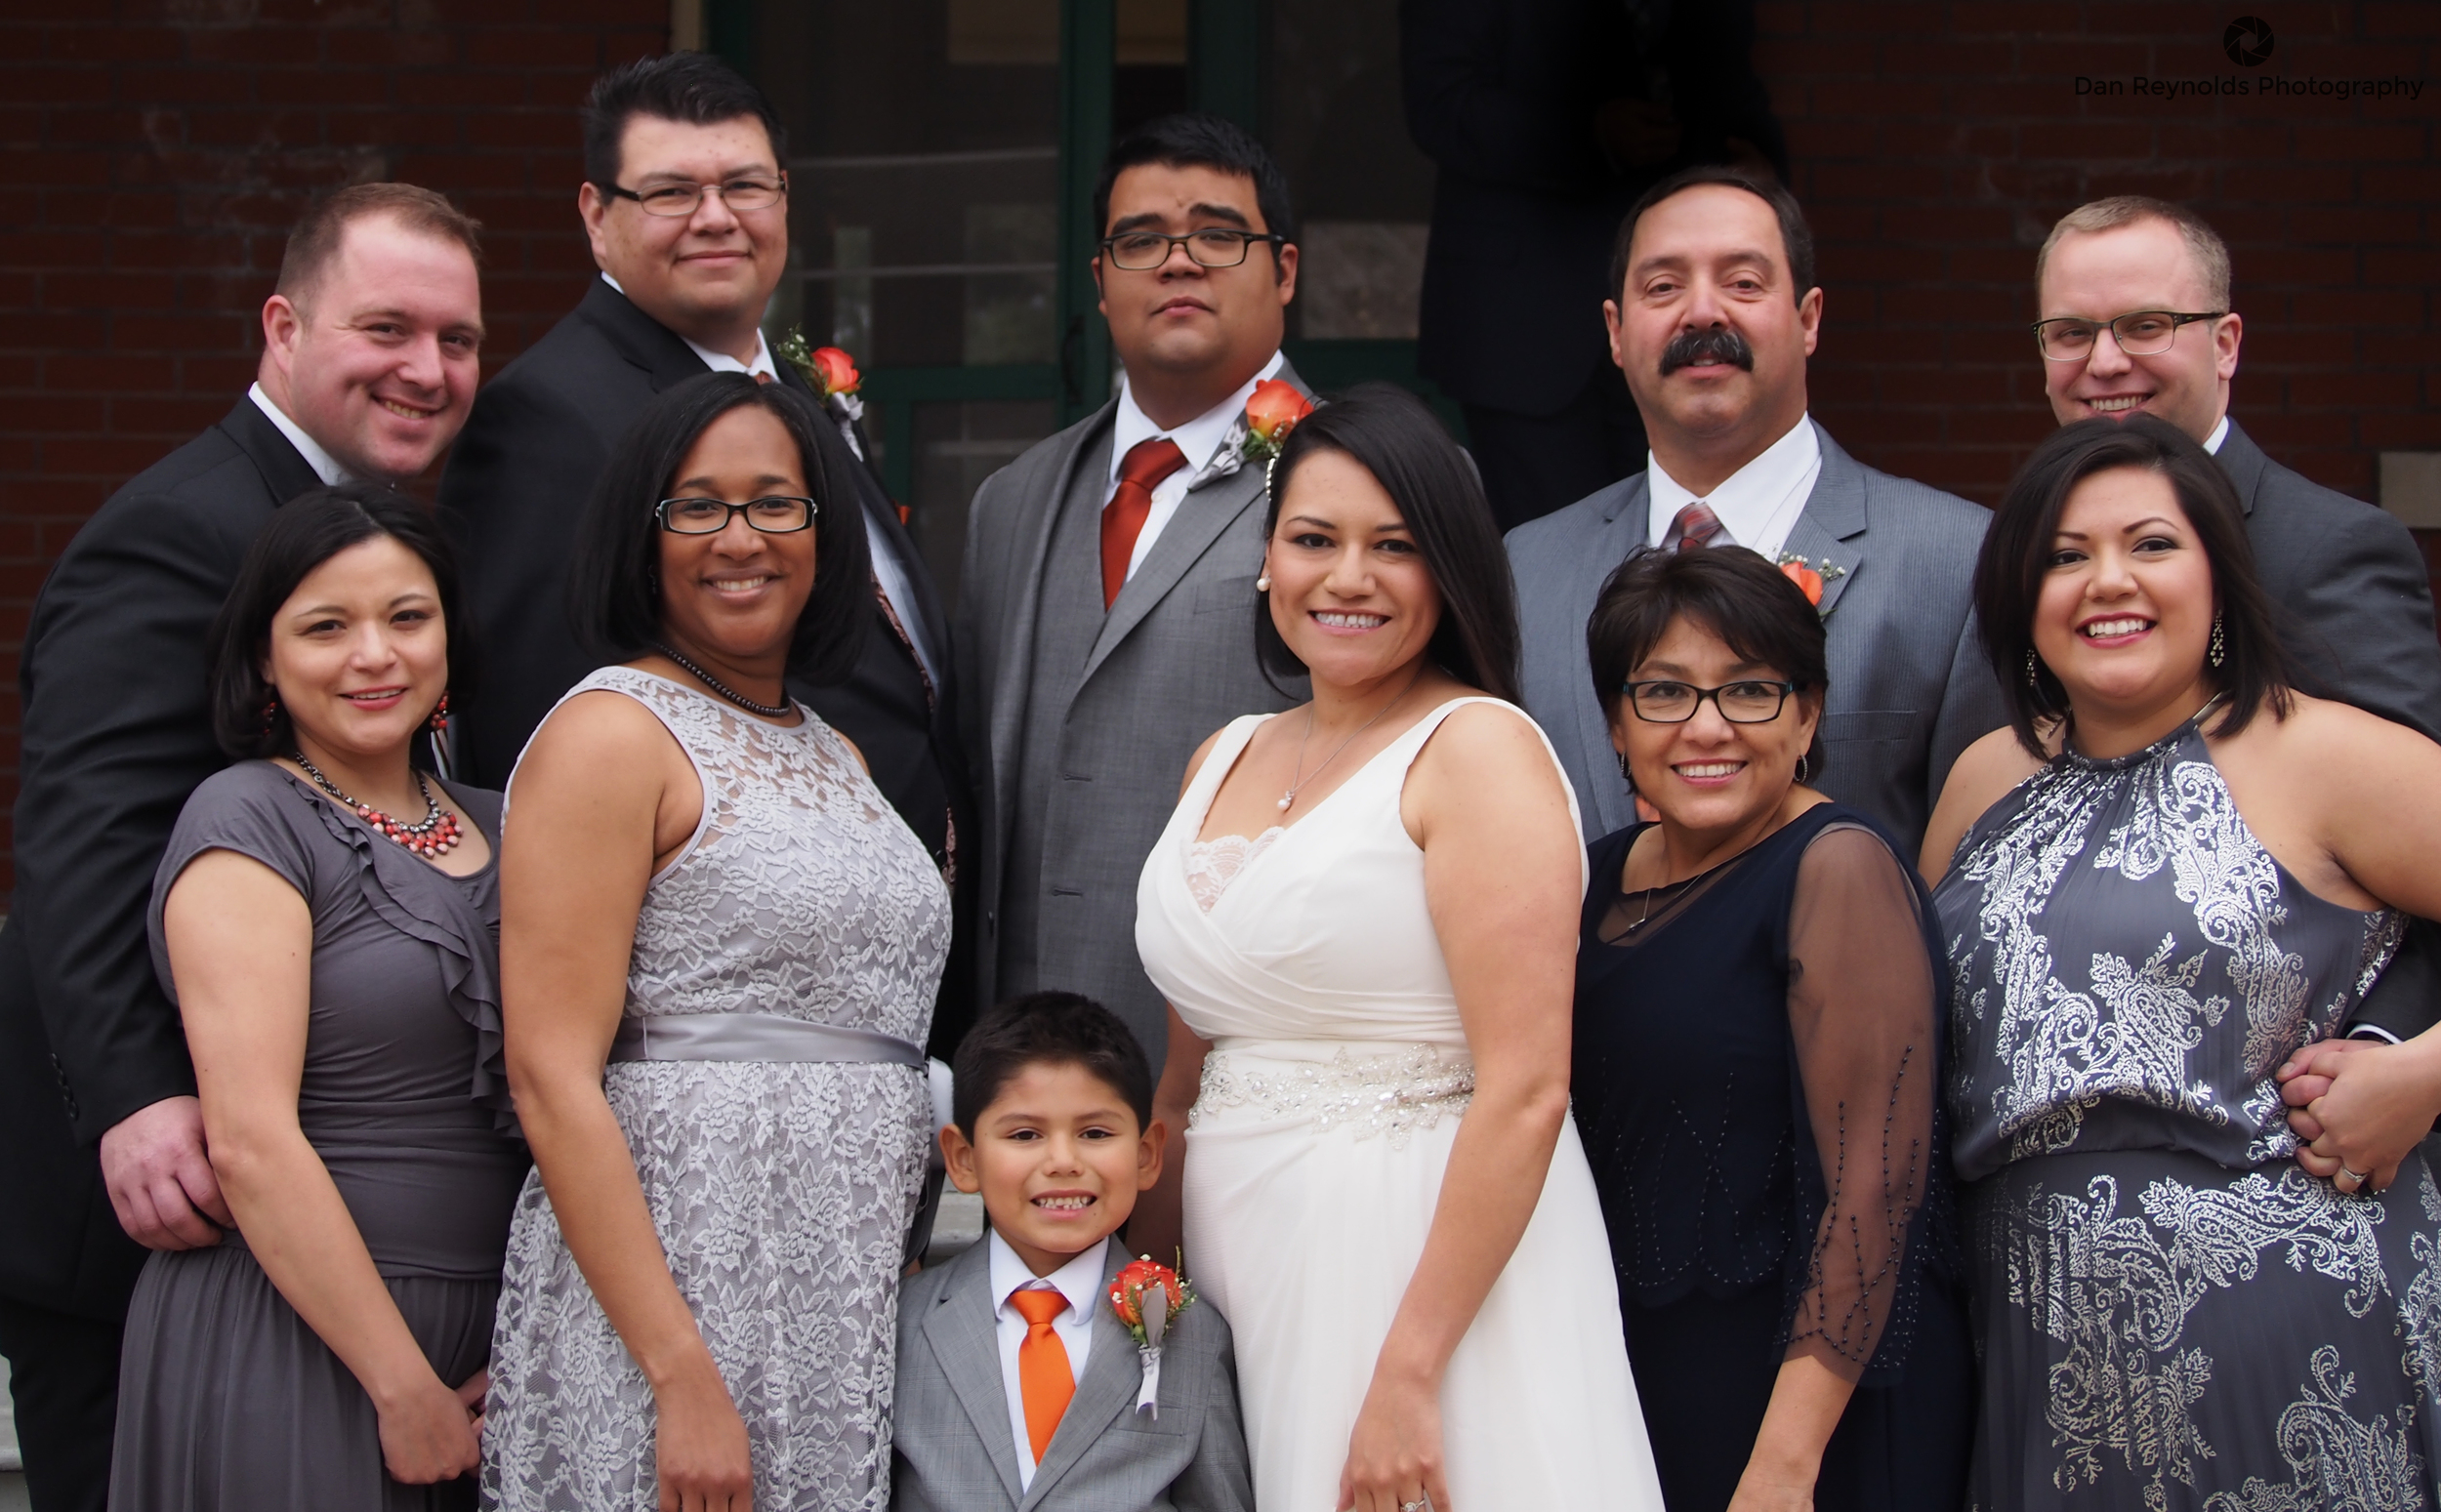 Rodriguez Wedding - Group Shot-1.jpg